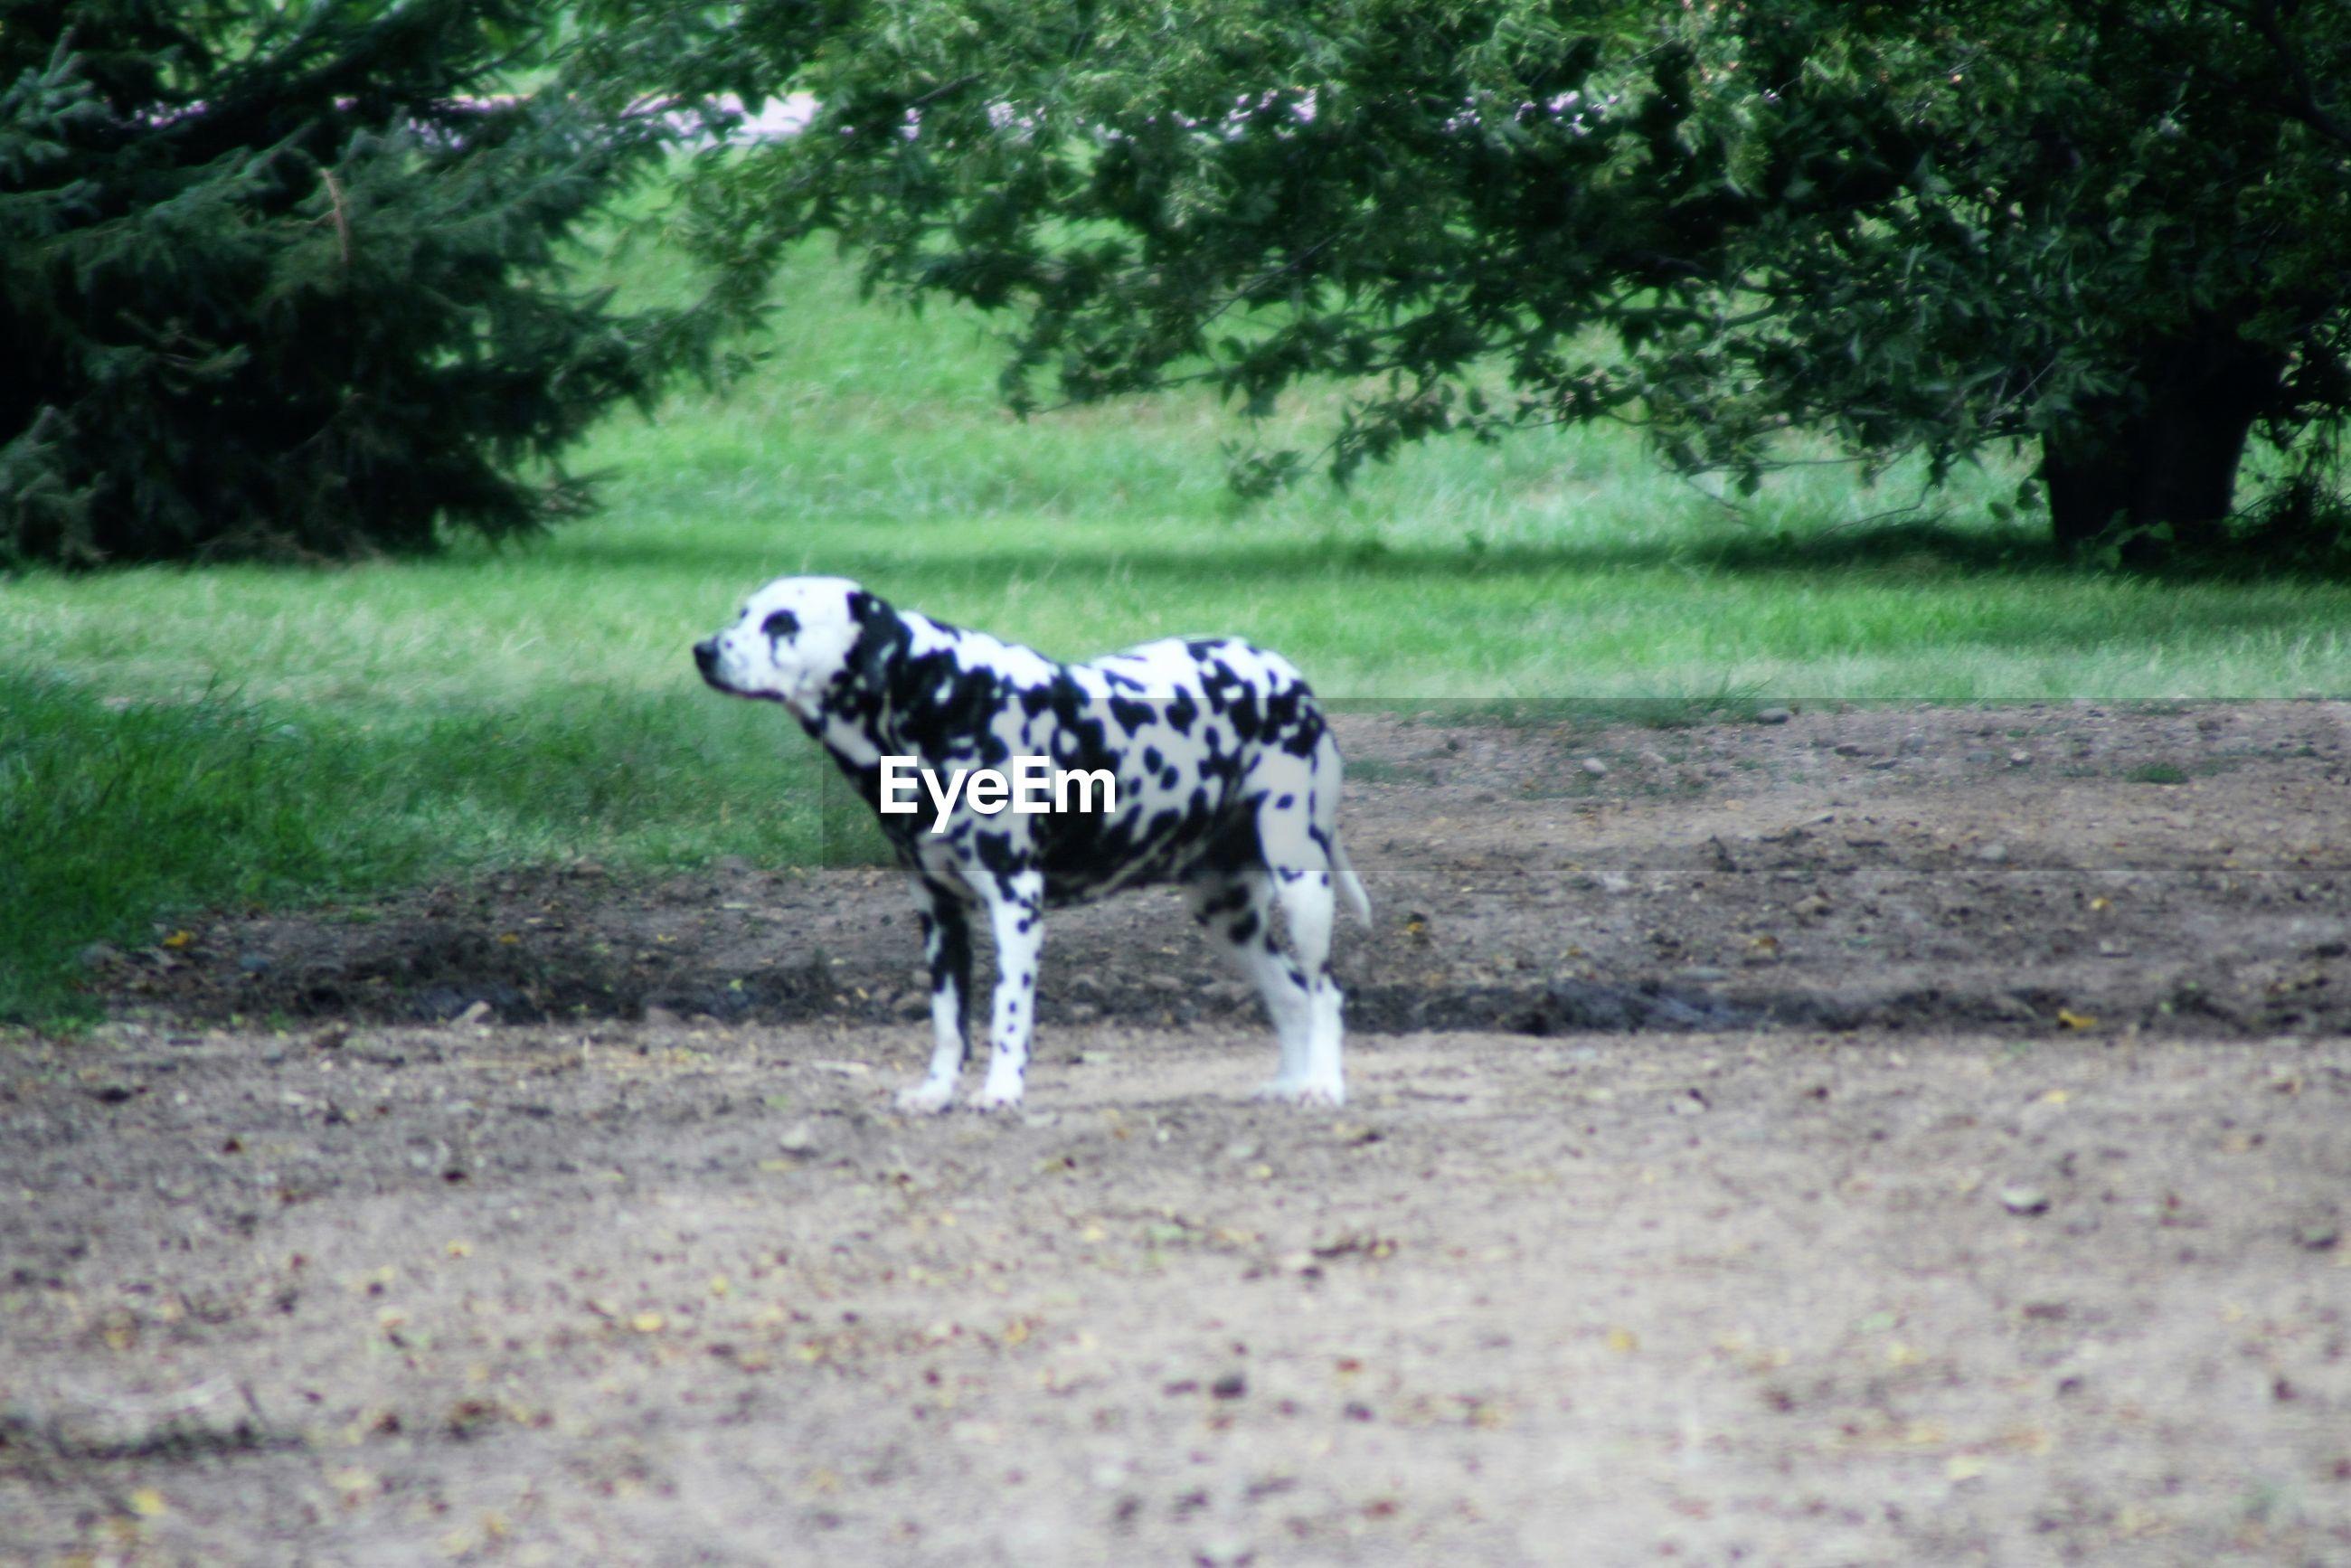 DOG STANDING ON GROUND